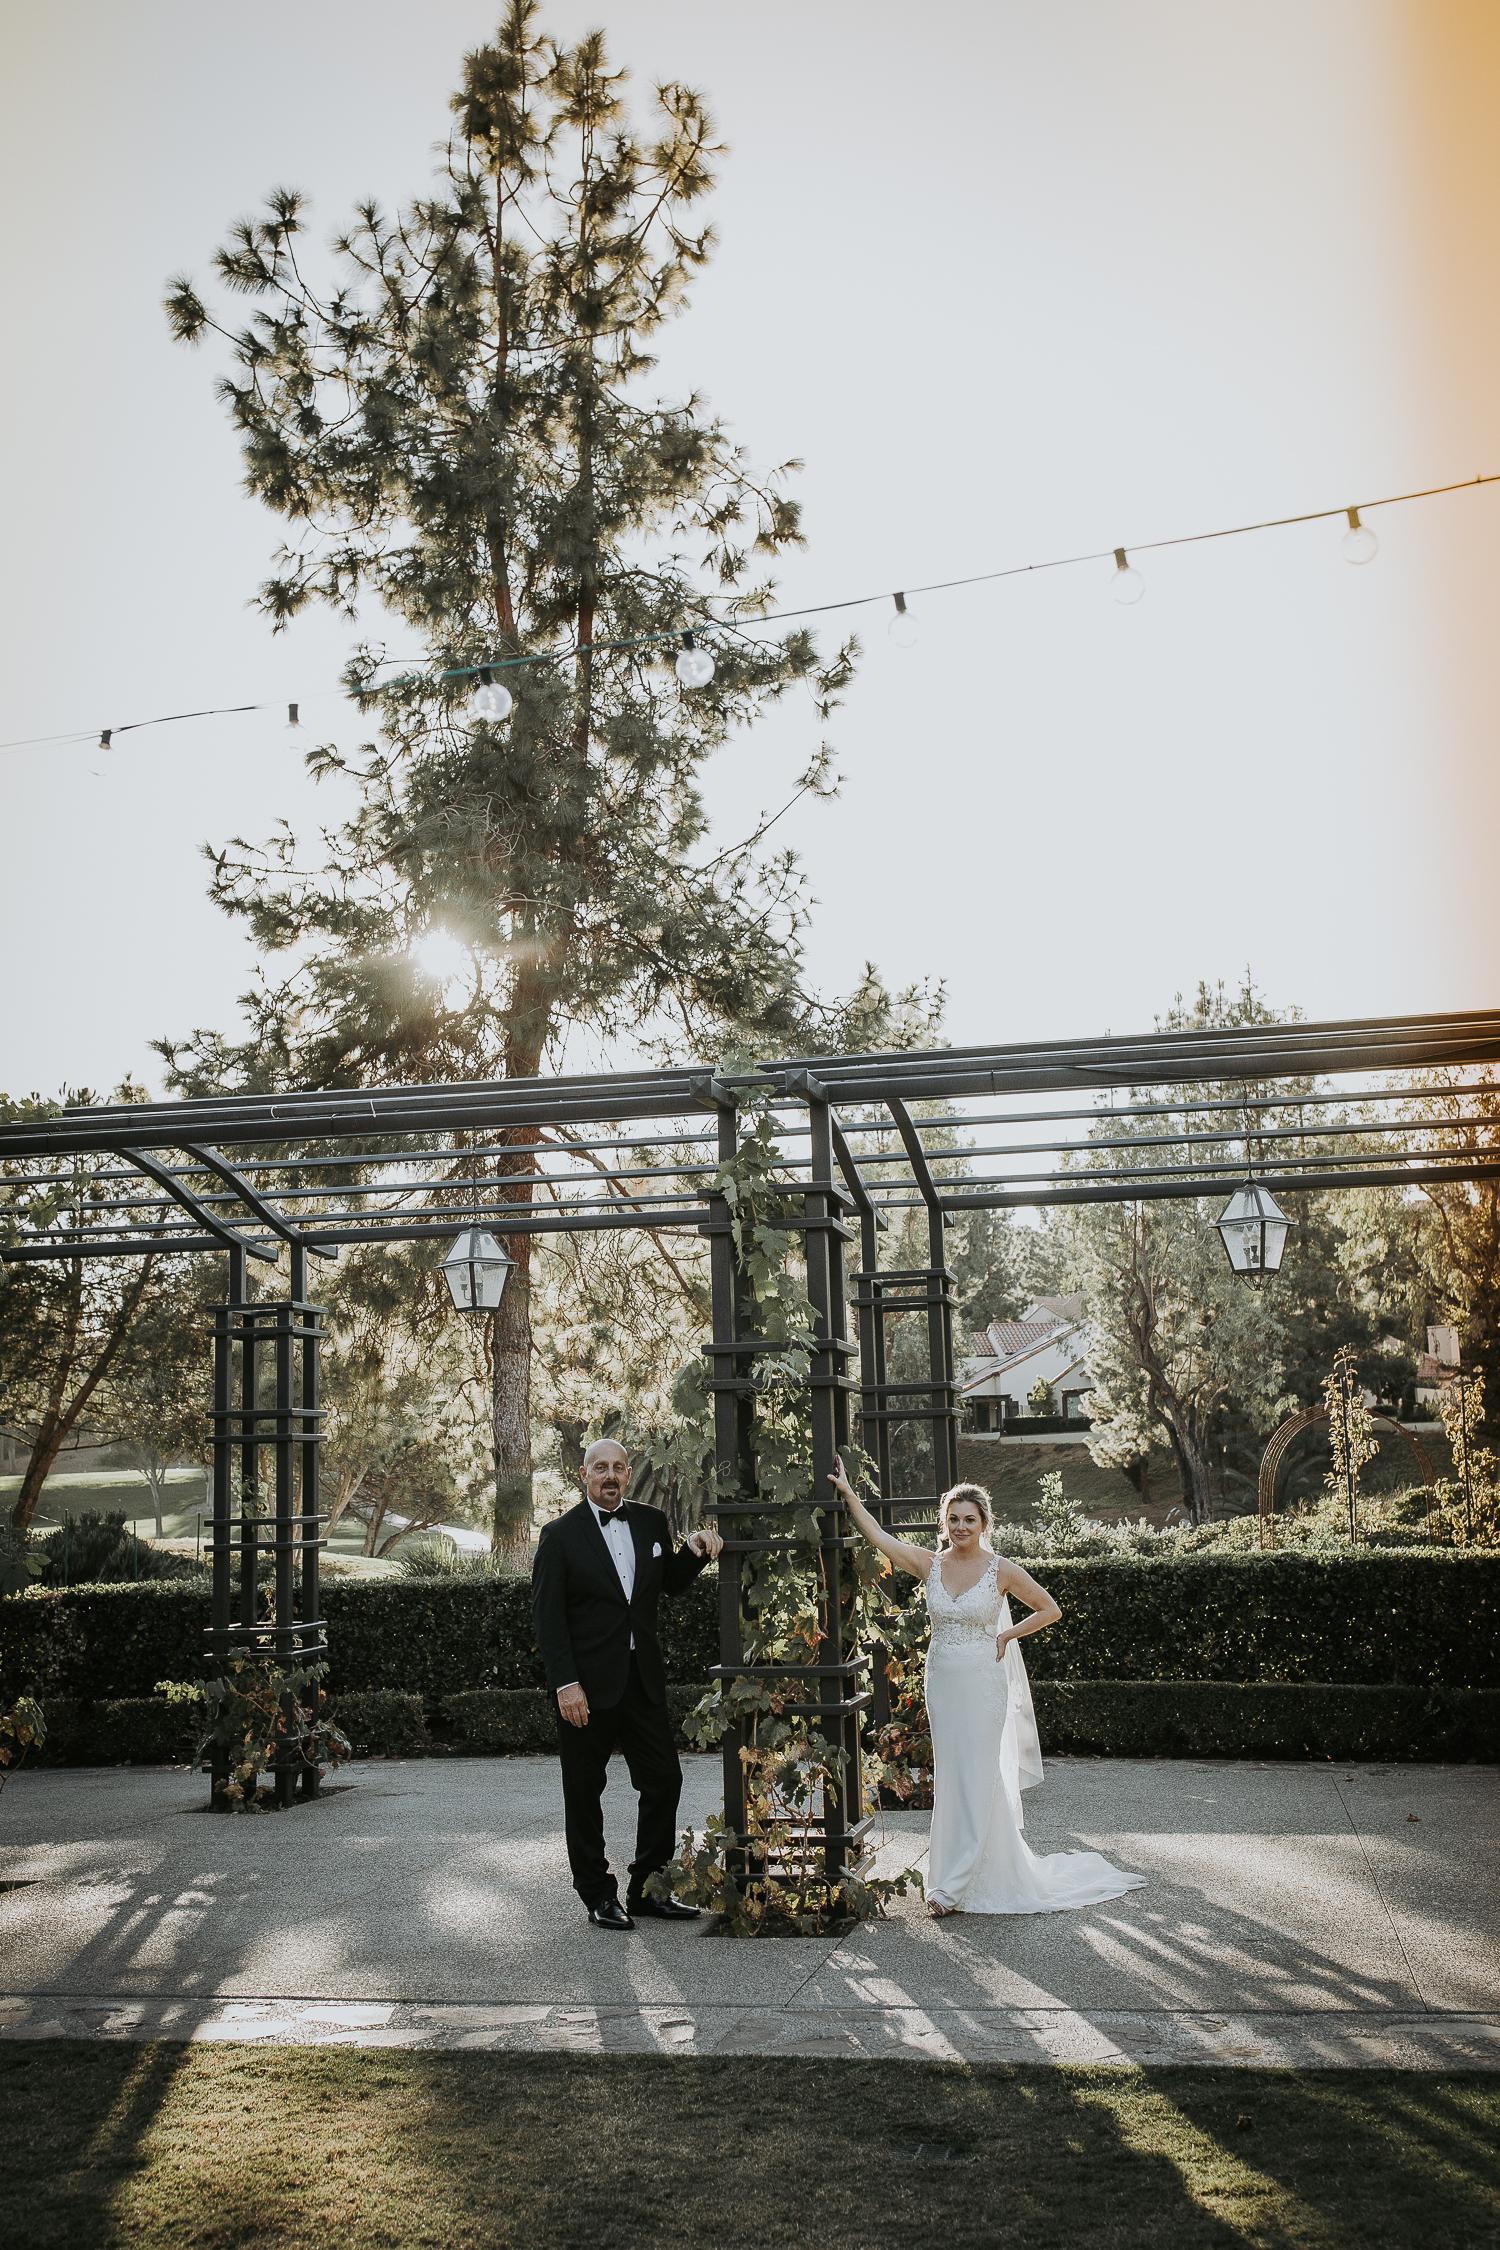 rancho-bernardo-inn-wedding-photos-melissa-montoya-photography